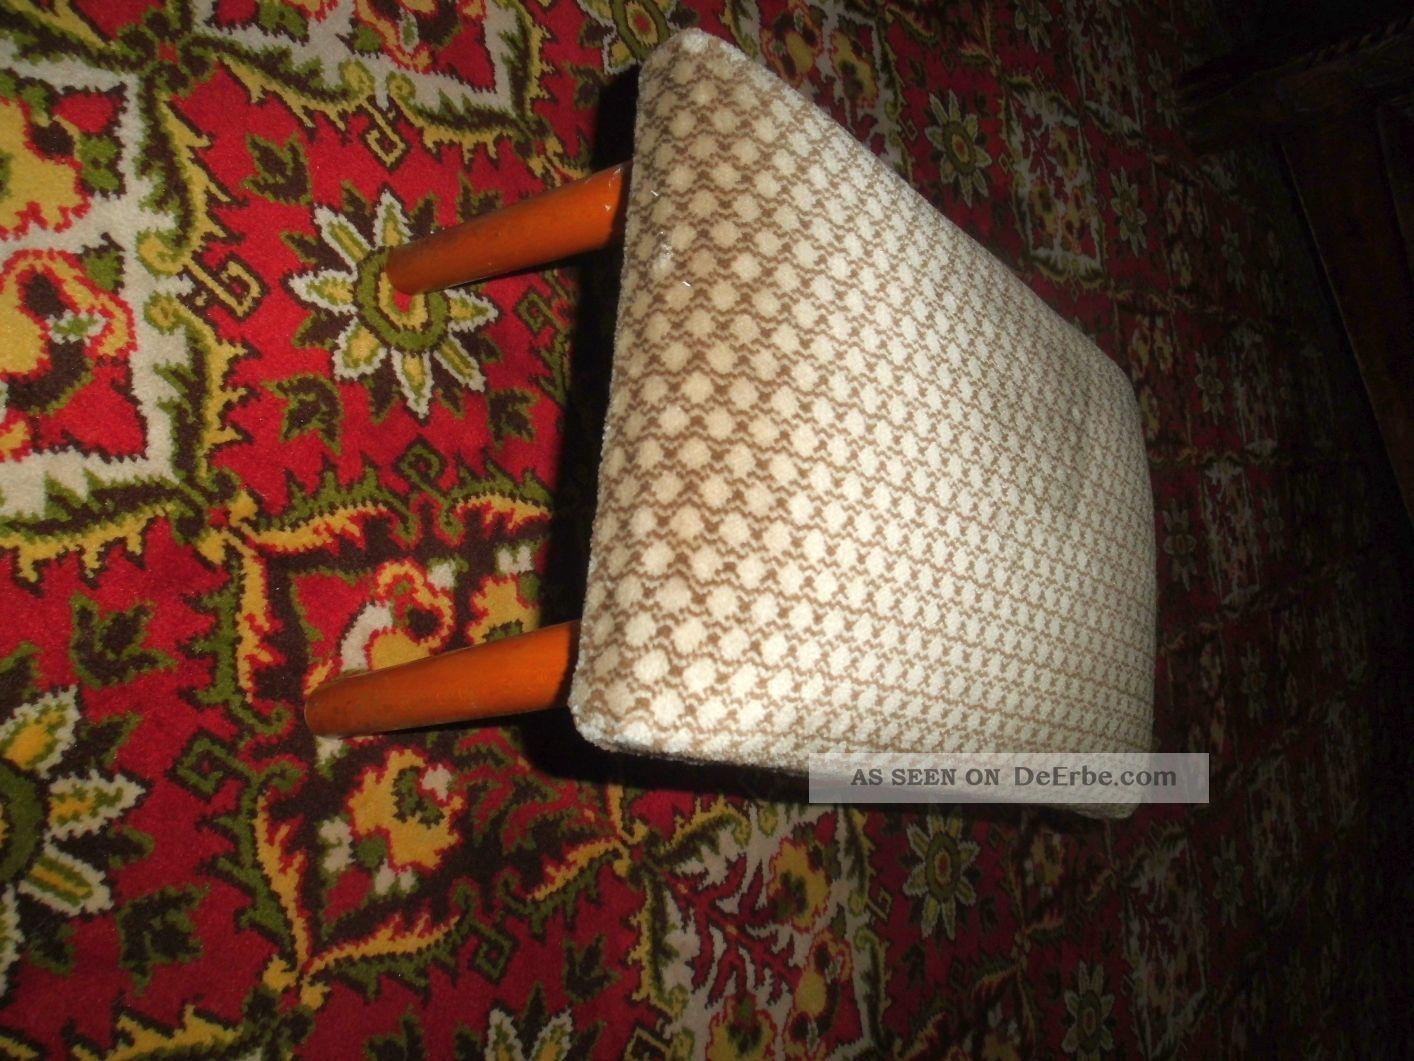 alte fu bank sucht sch ne saubere gepflegte f e fu hocker. Black Bedroom Furniture Sets. Home Design Ideas